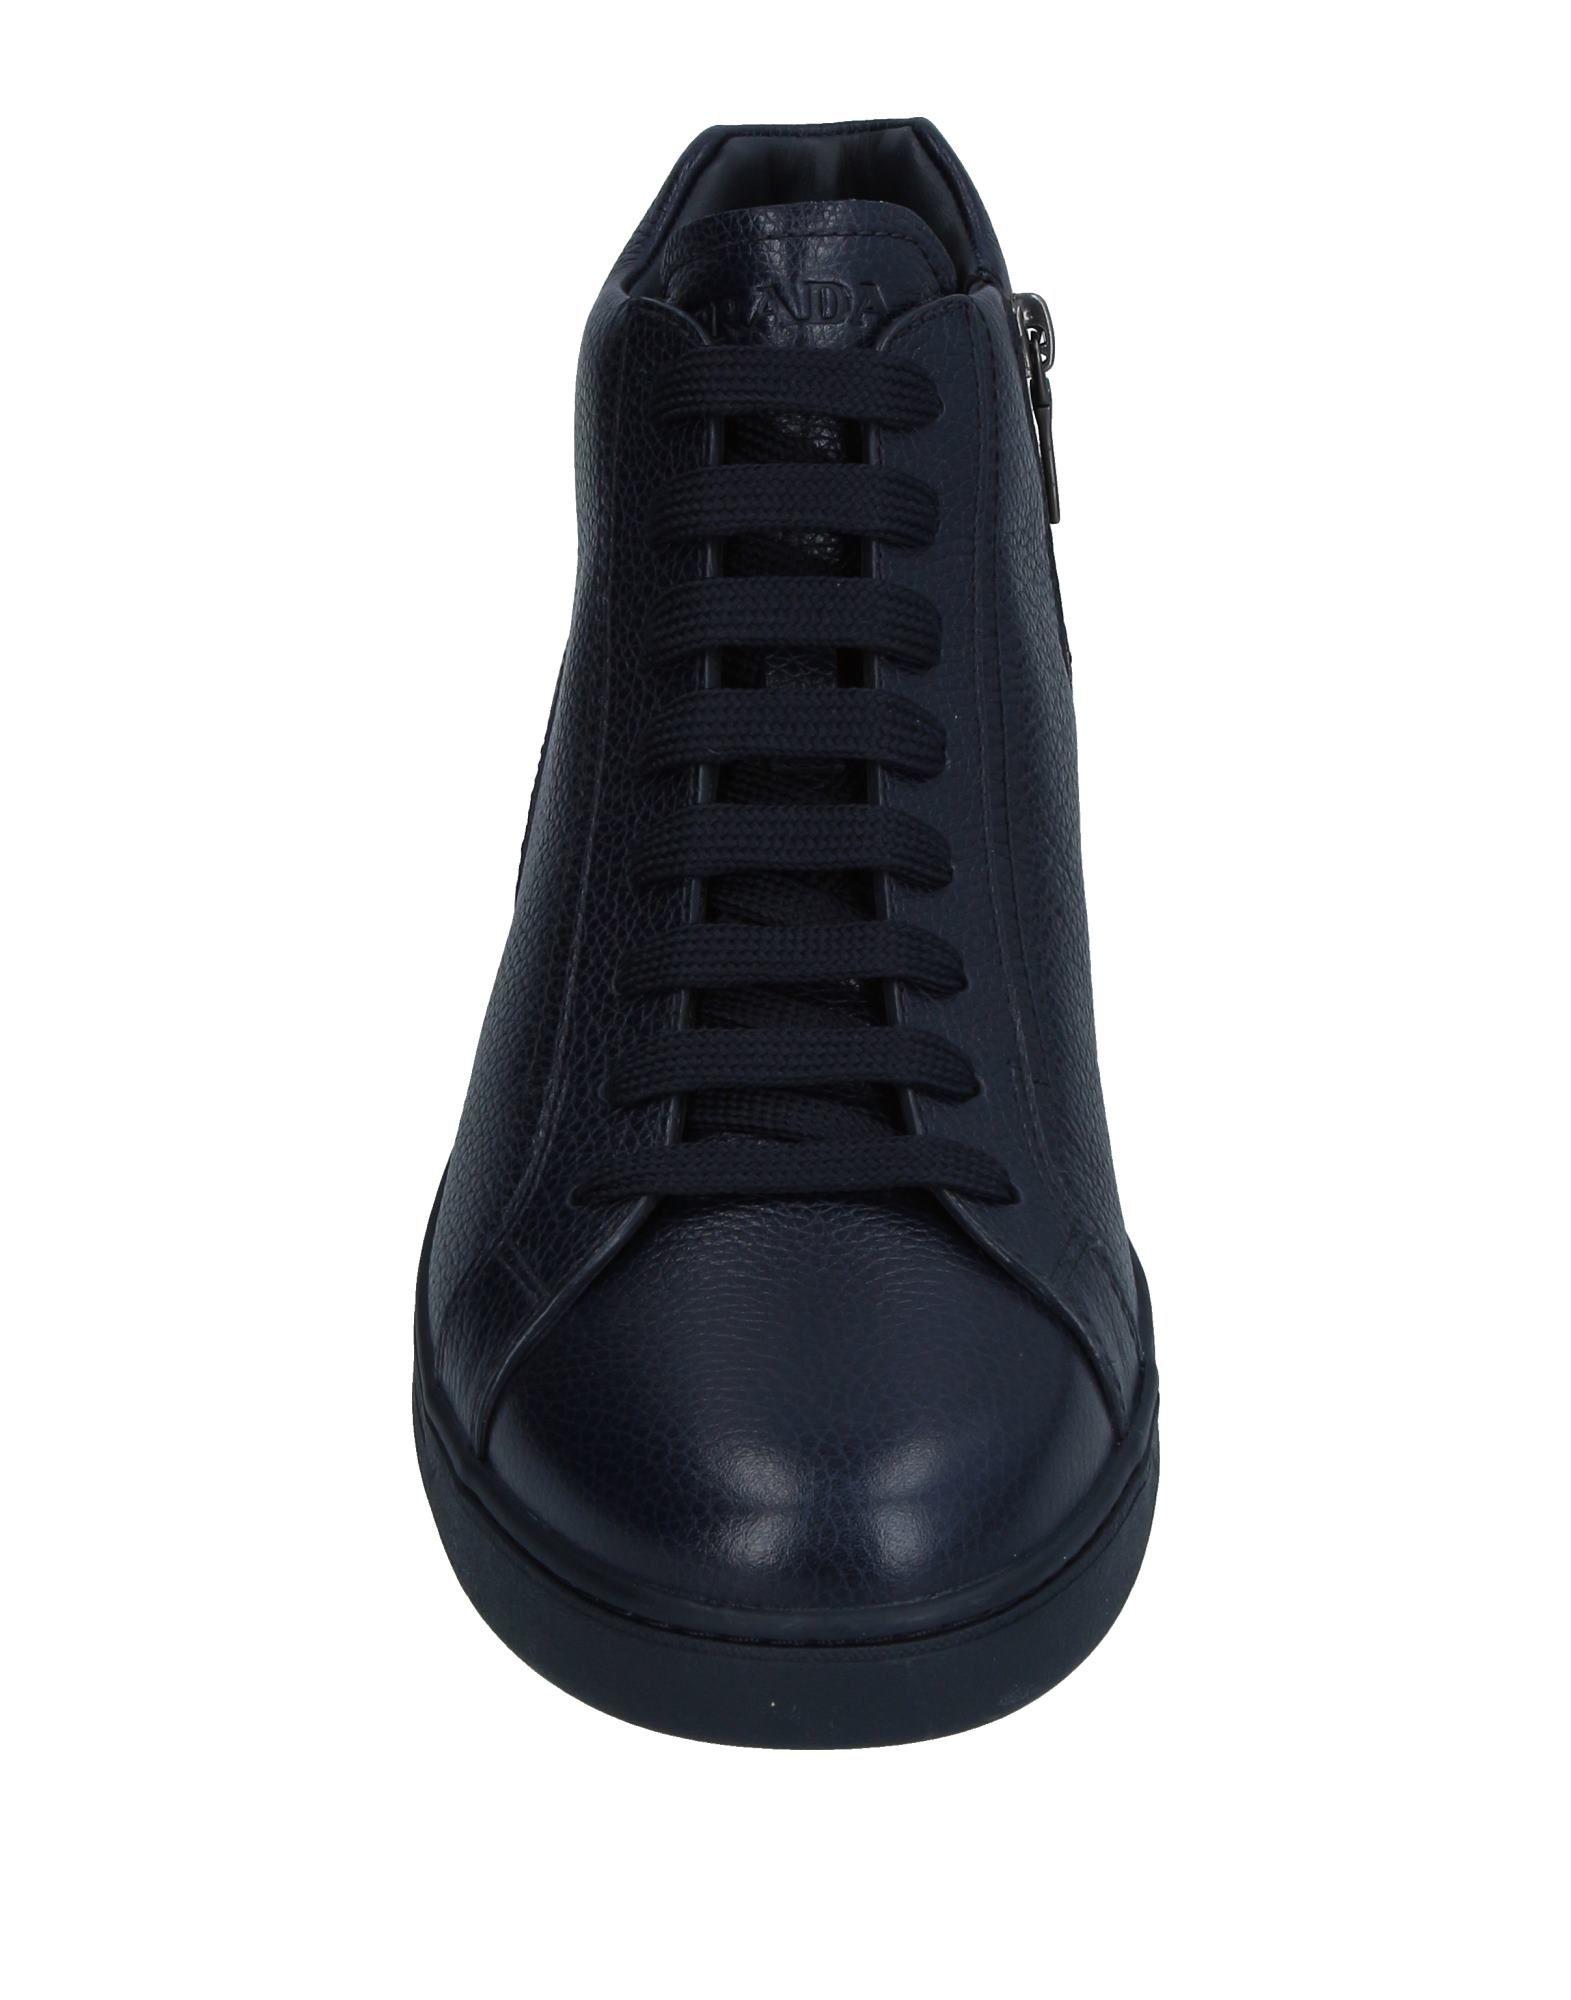 Prada Sport 11260639XS Sneakers Herren  11260639XS Sport 8a5e46